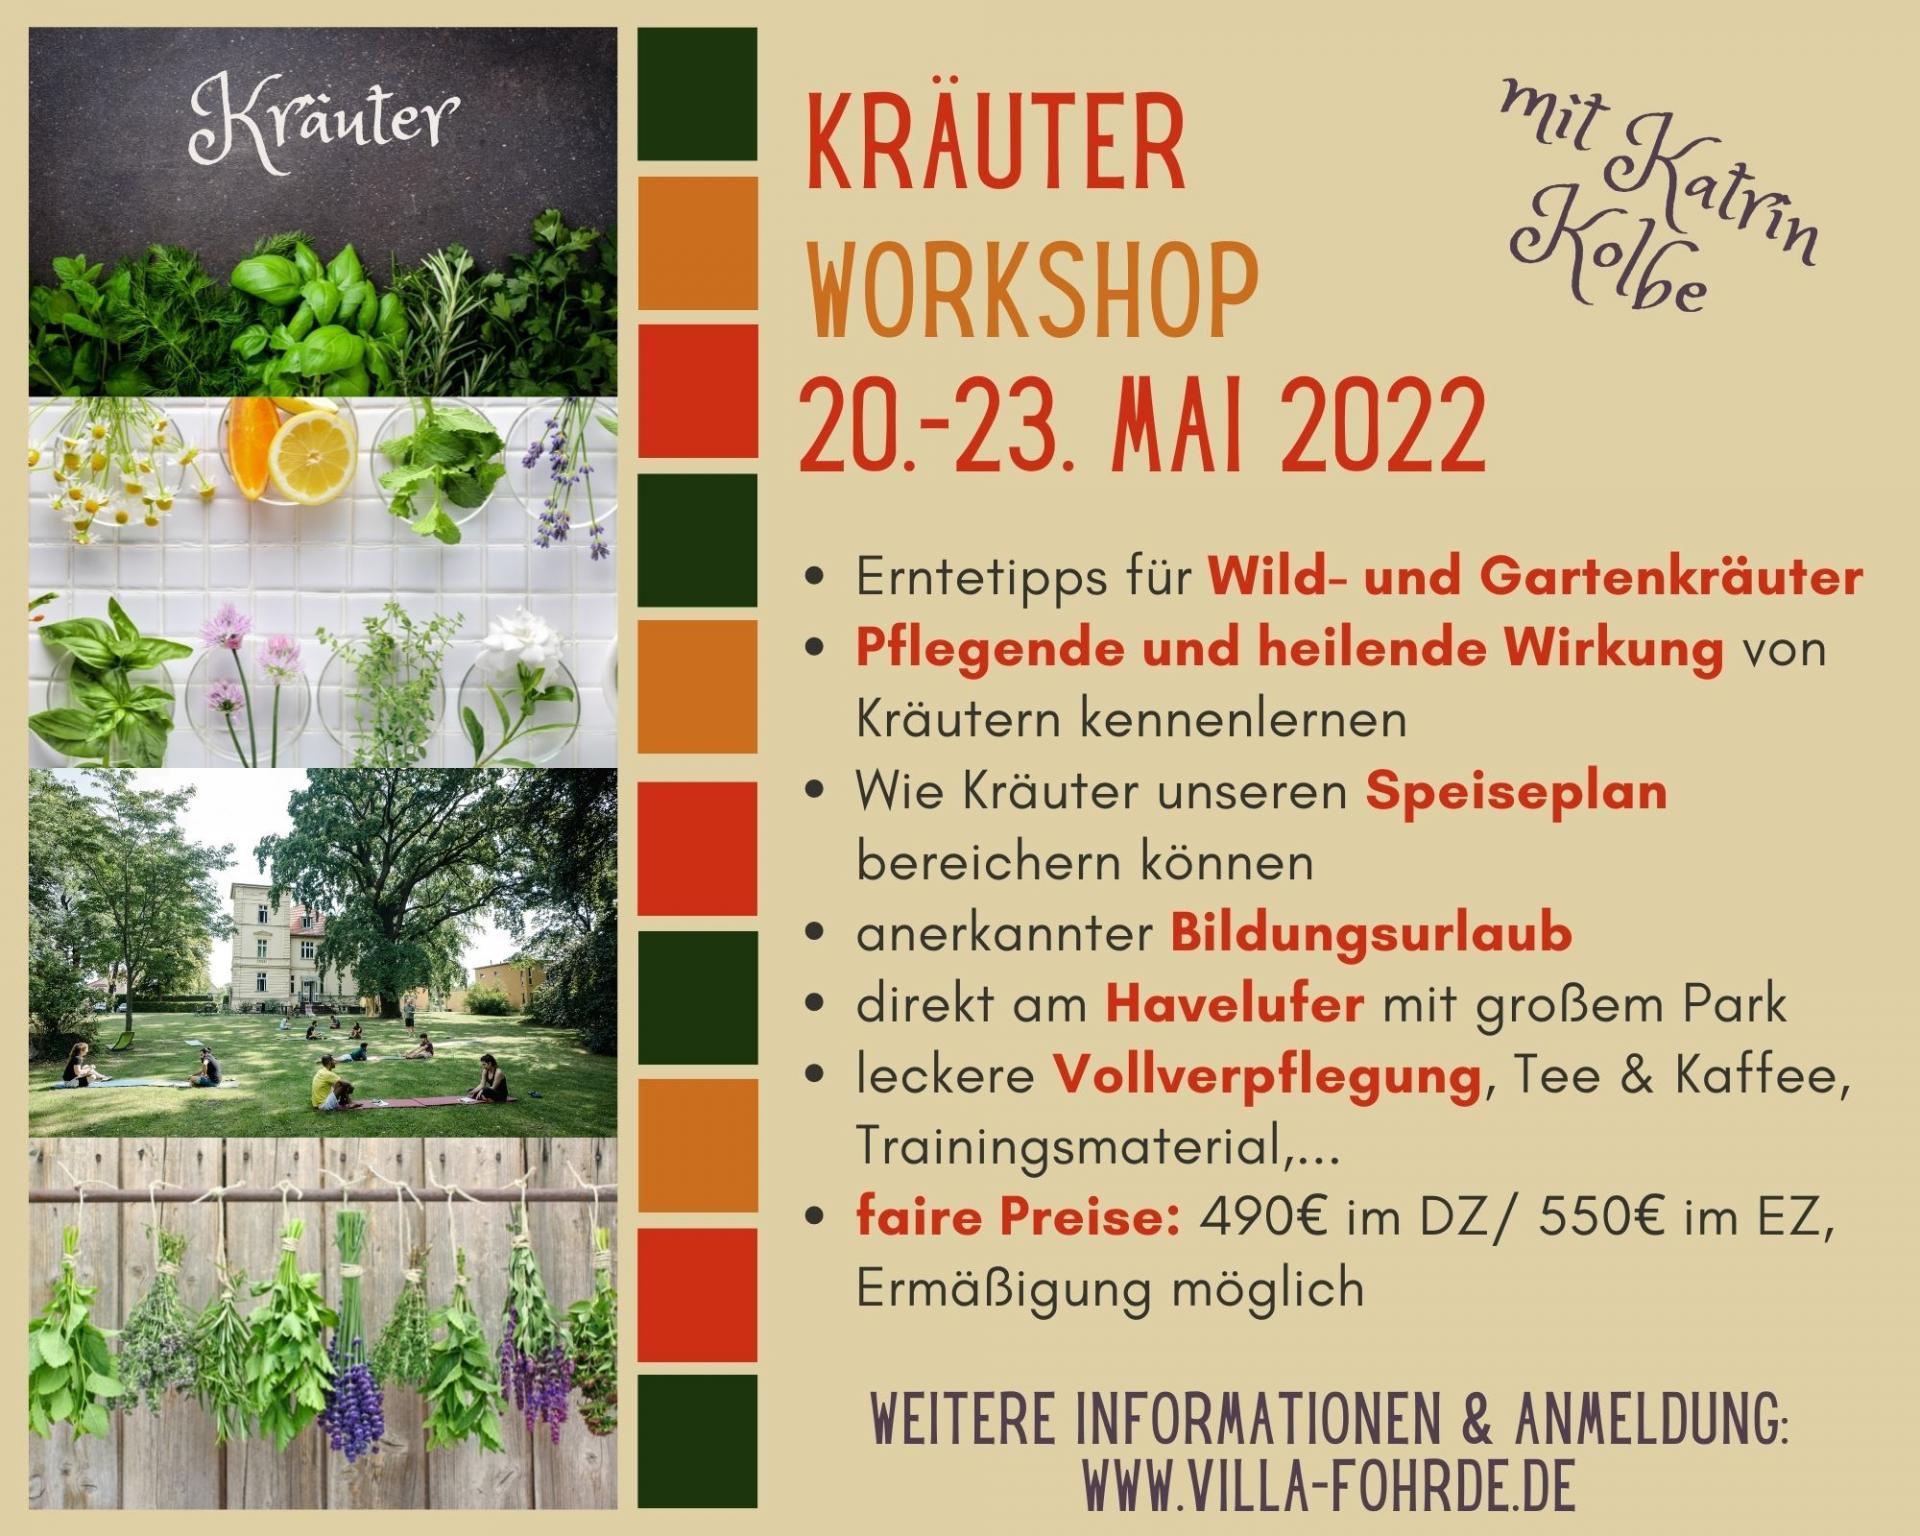 Kräuterworkshop